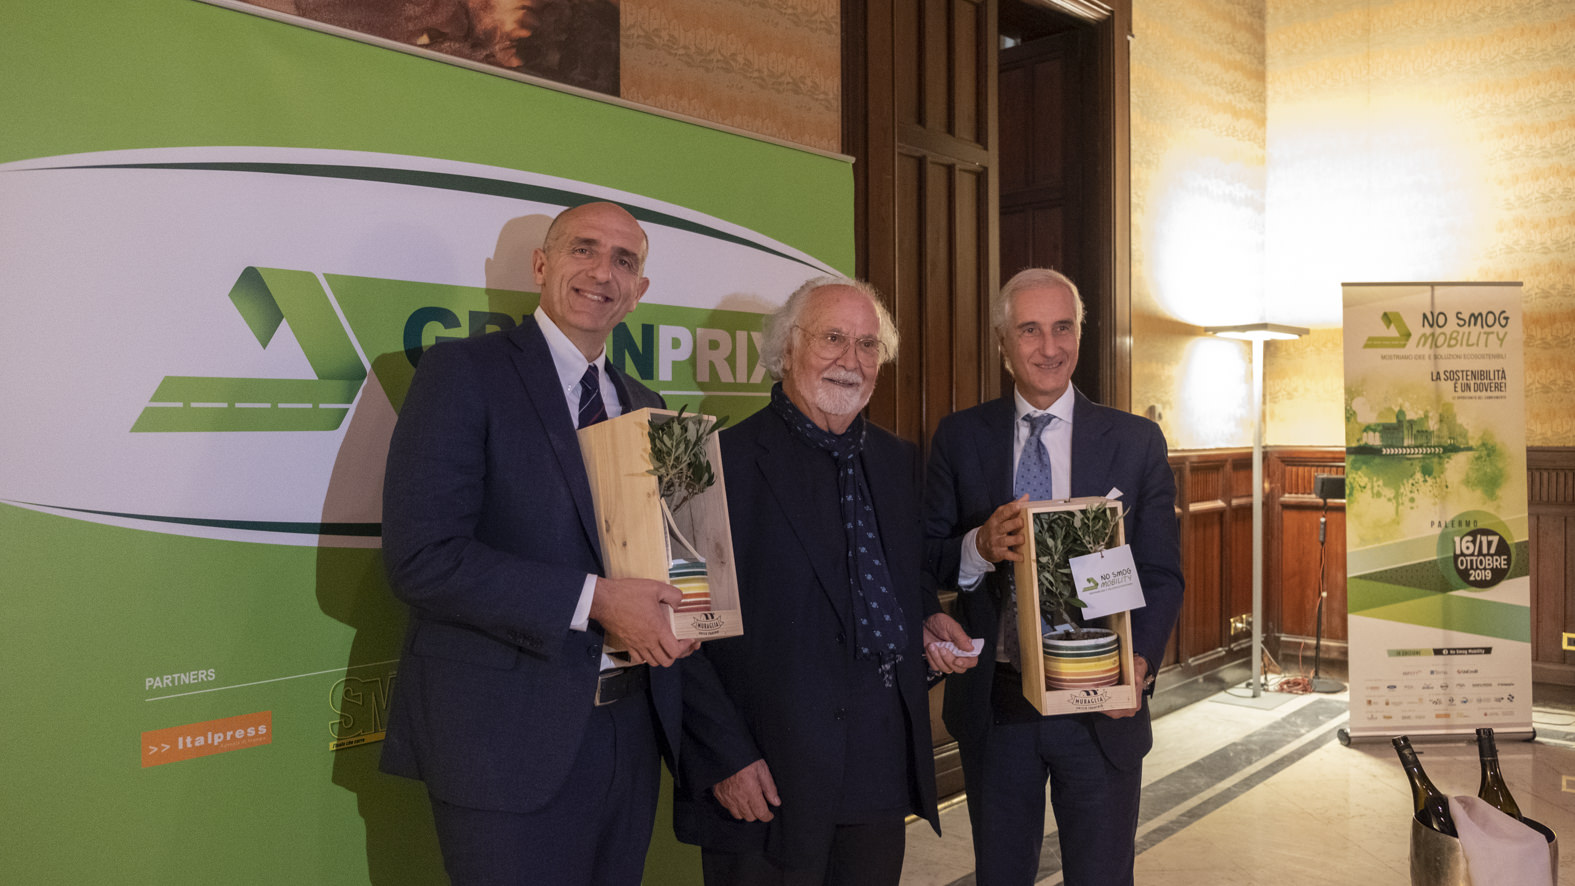 MOTORI, I GREEN PRIX 2019 ASSEGNATI A NISSAN E PSA